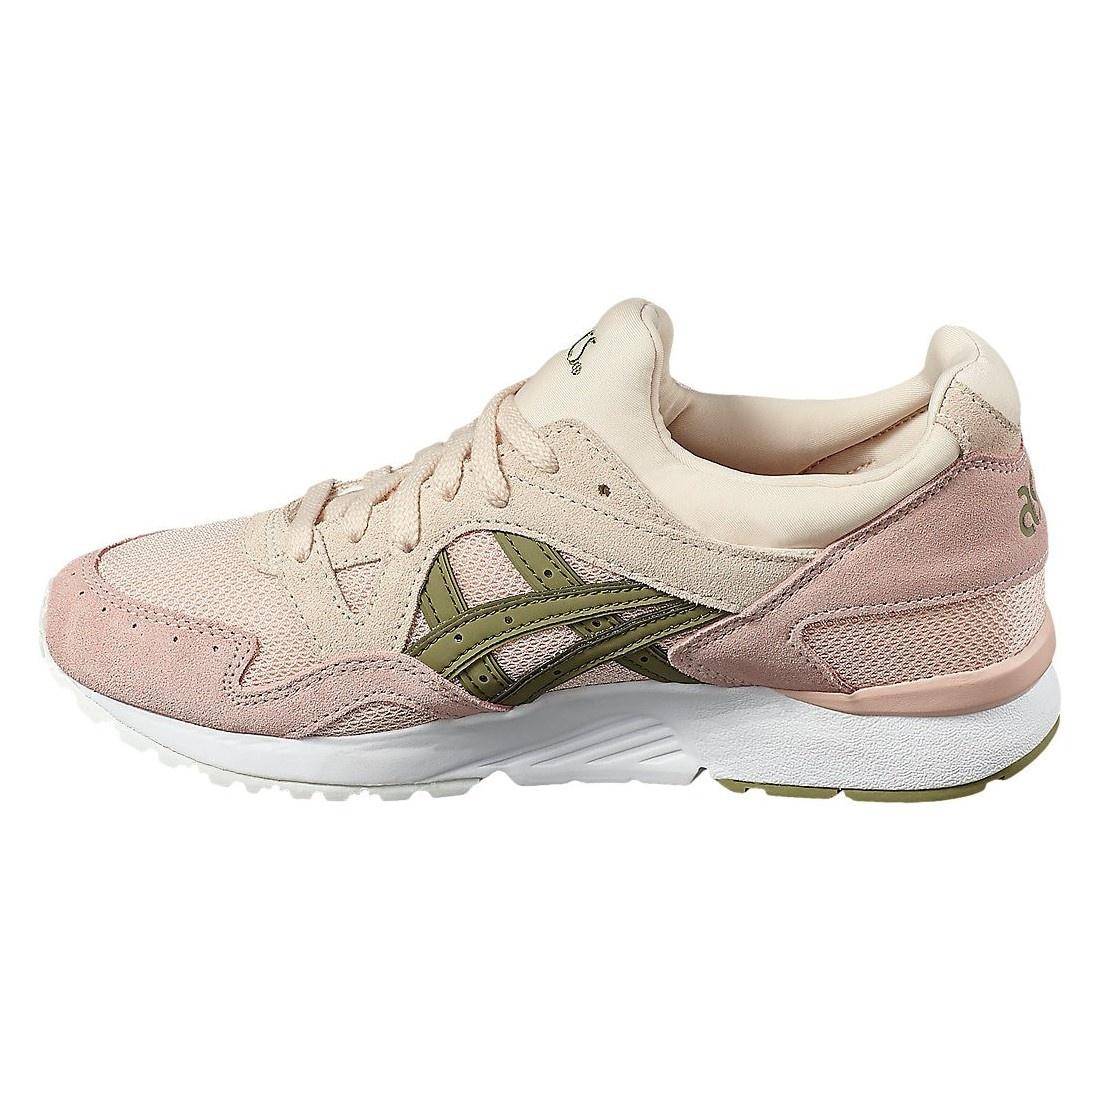 کفش راحتی زنانه اسیکس مدل GEL-LYTE